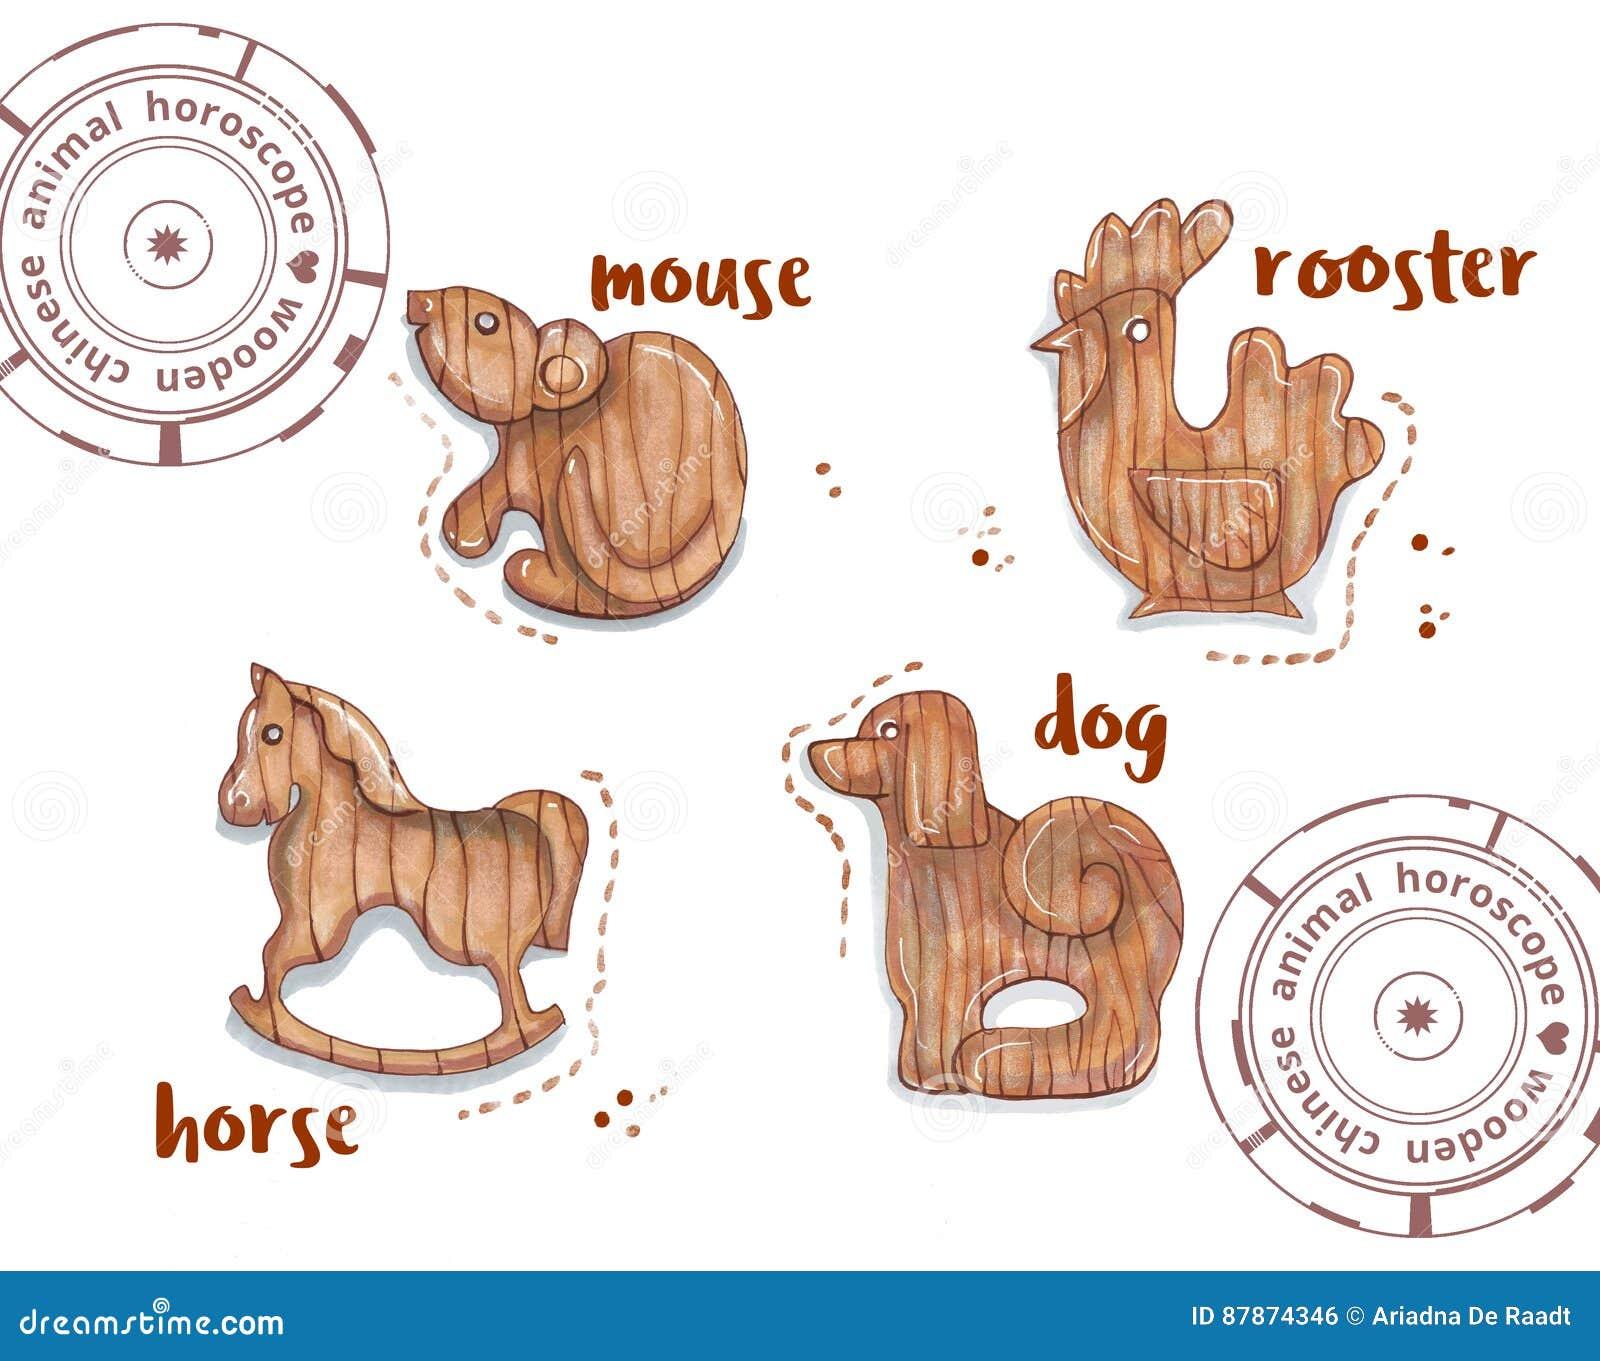 Horoscope animal as wooden toys